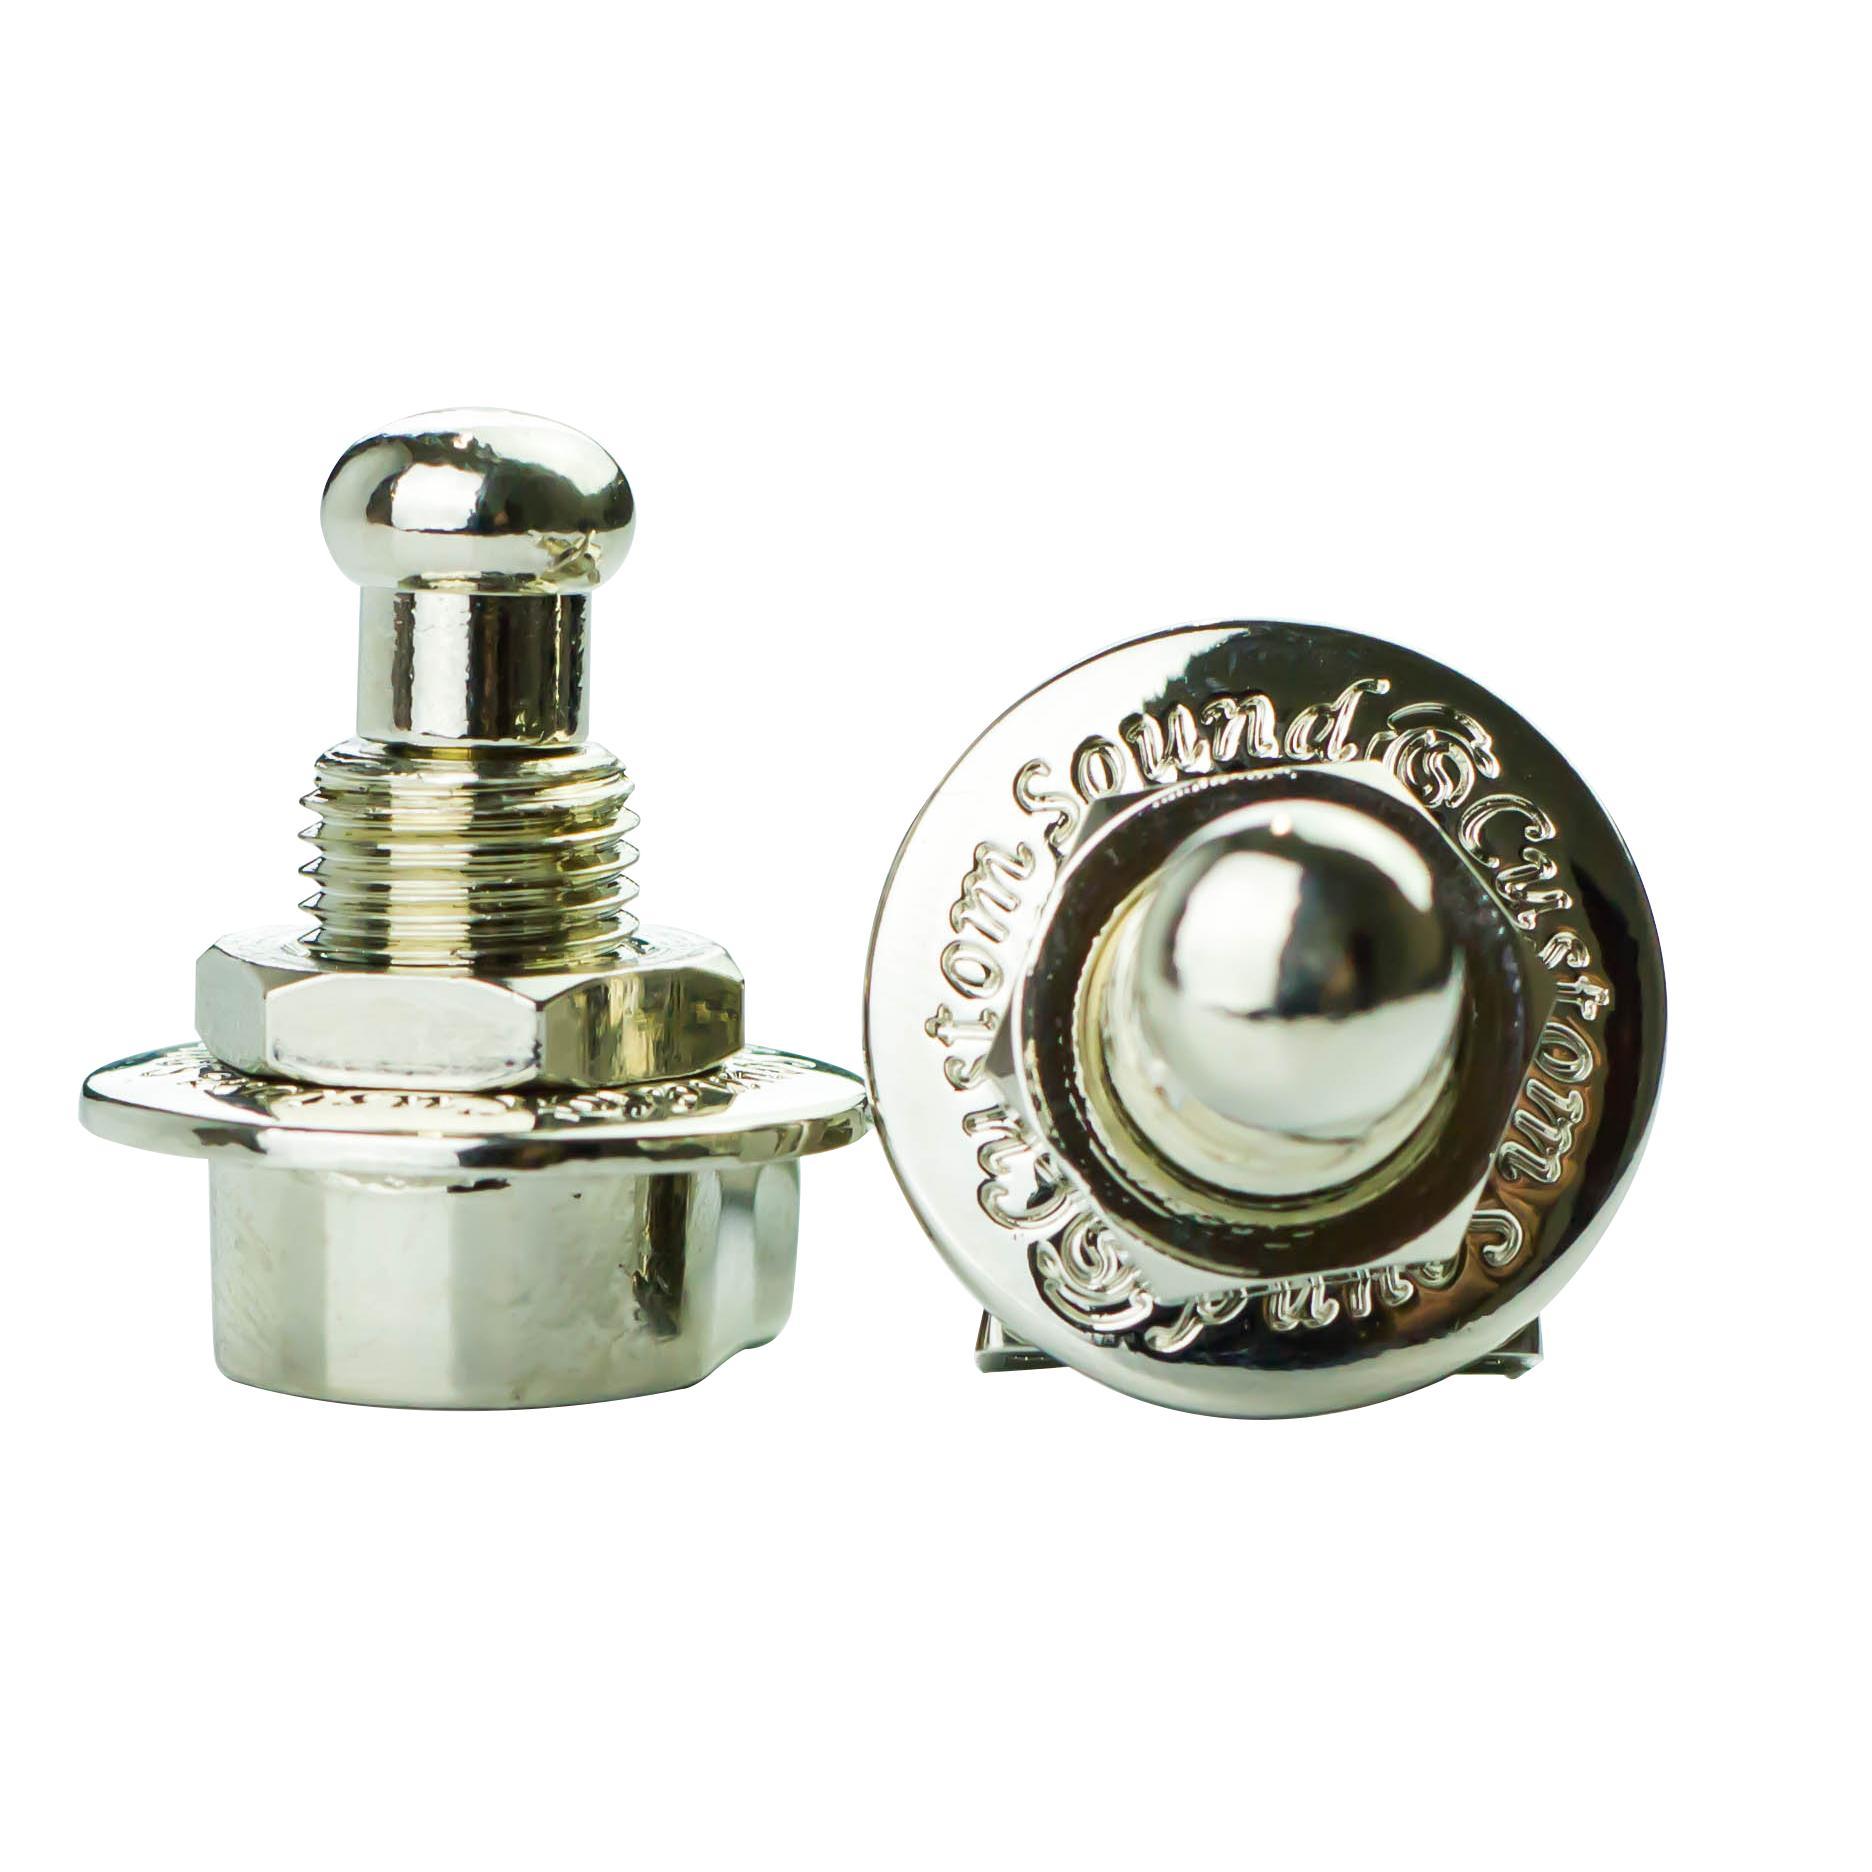 Trava Mecânica para Correias Strap Lock S-1 (Cromado)